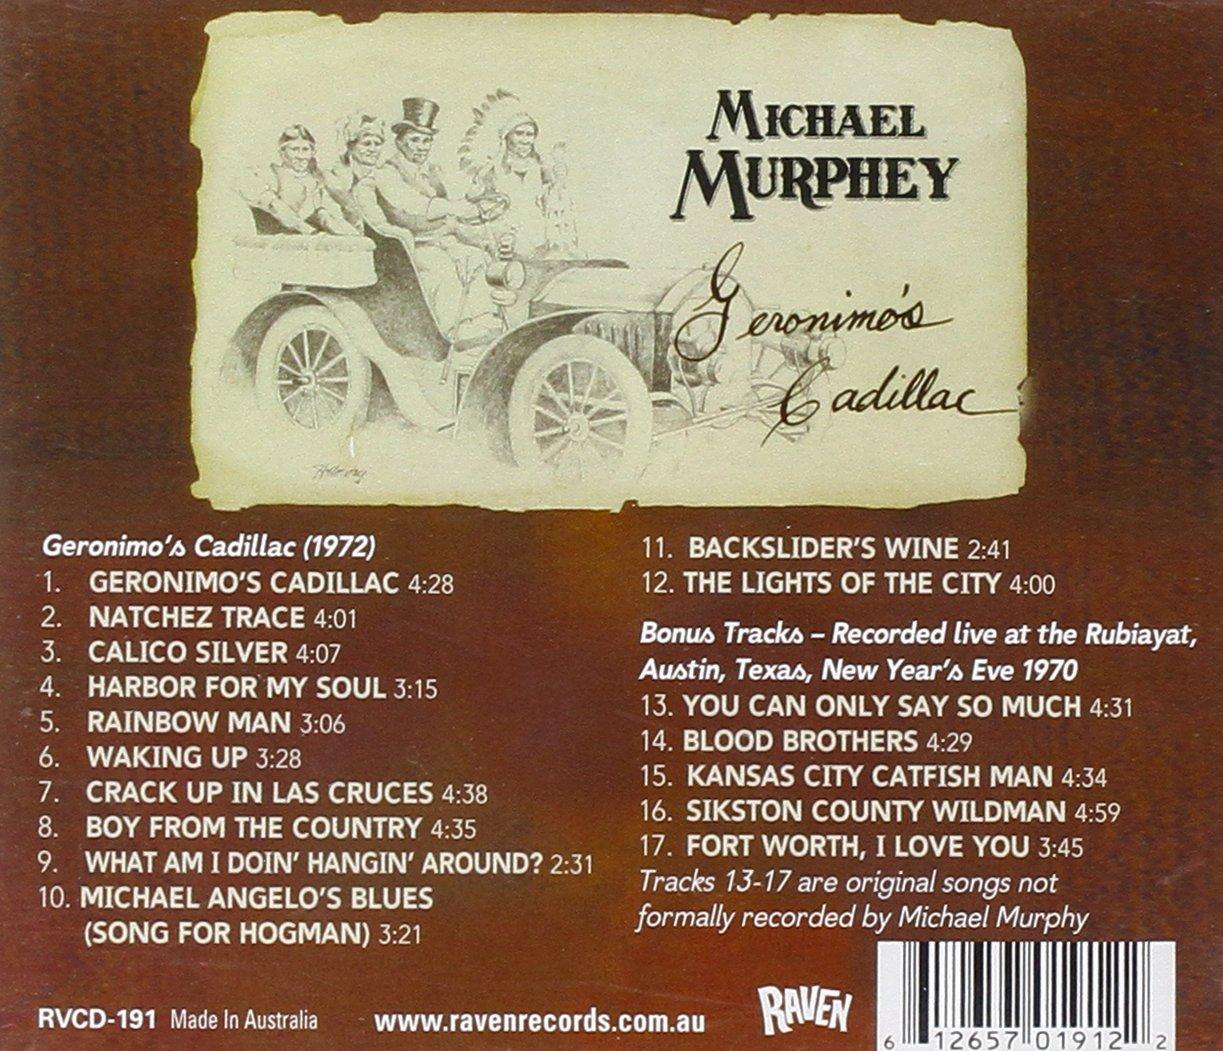 Michael Murphey - Geronimo's Cadillac - Amazon.com Music